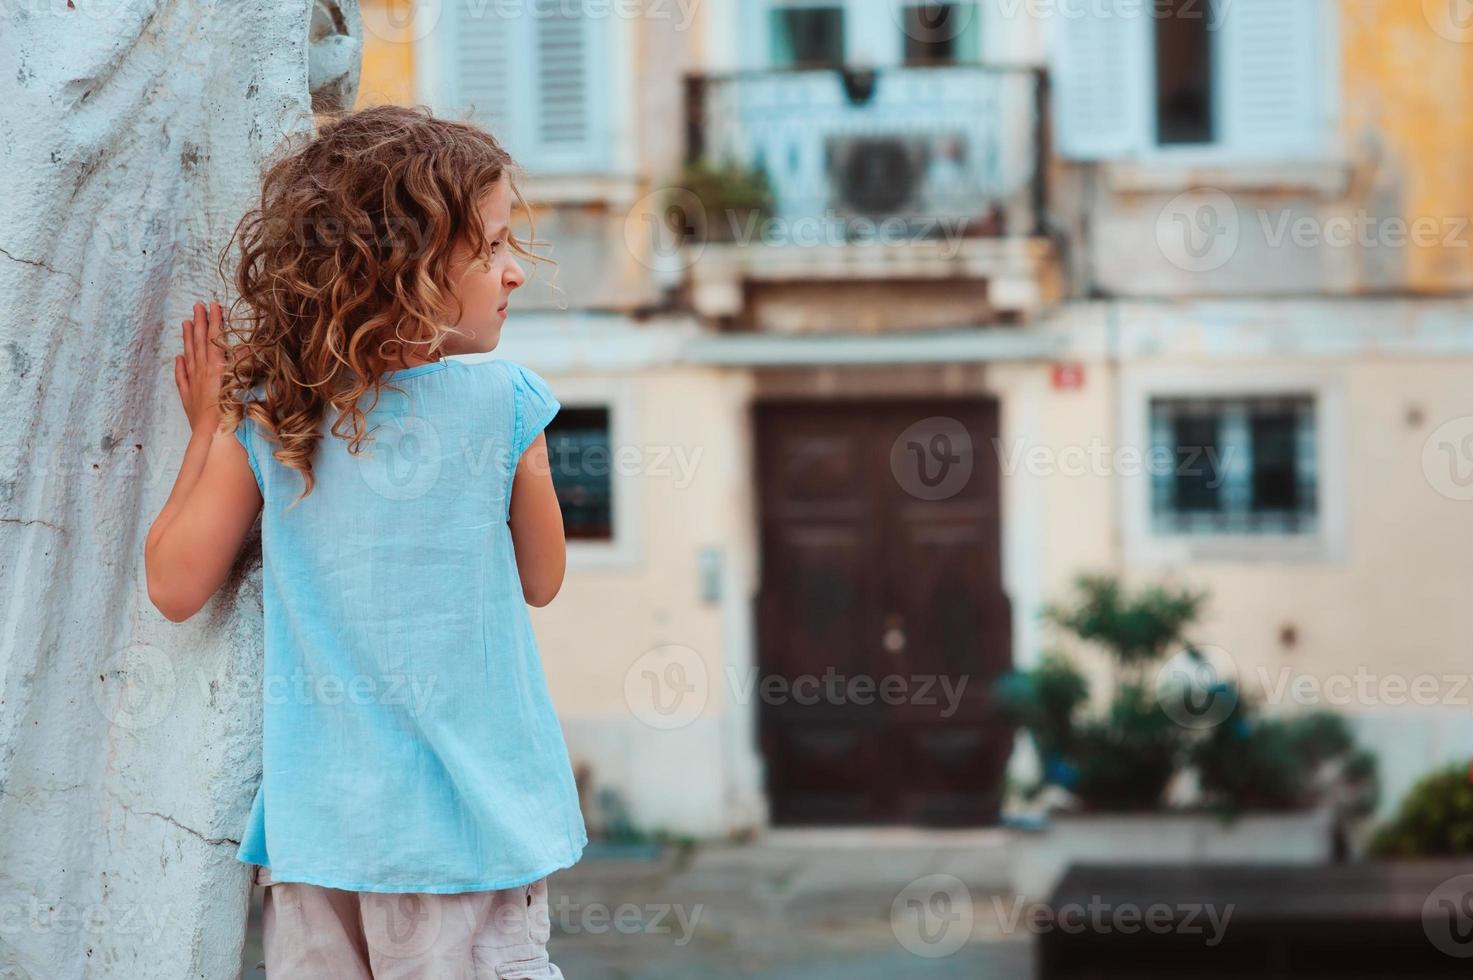 ourist child girl walking on streets of Piran, Slovenia photo